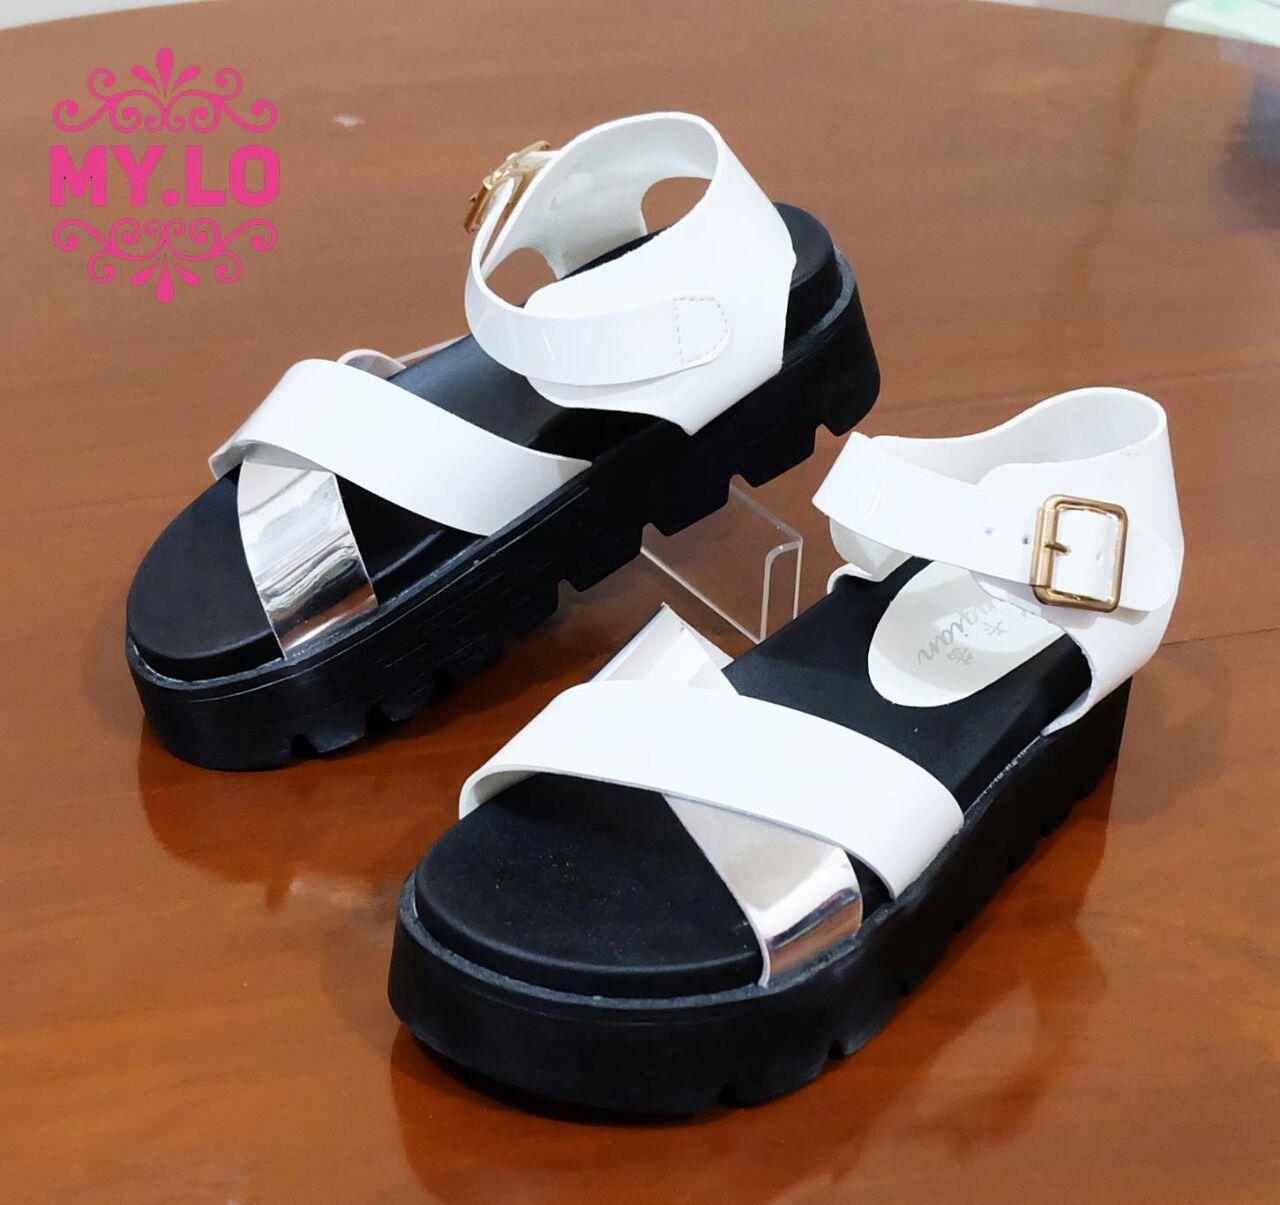 Kode Ms1296 Warna White Size 36 39 Harga 200rb Kualitas Import High Quality Pemesanna Via Sms N Wa 081558283656 Pin Bb Shoes Sandals Birkenstock